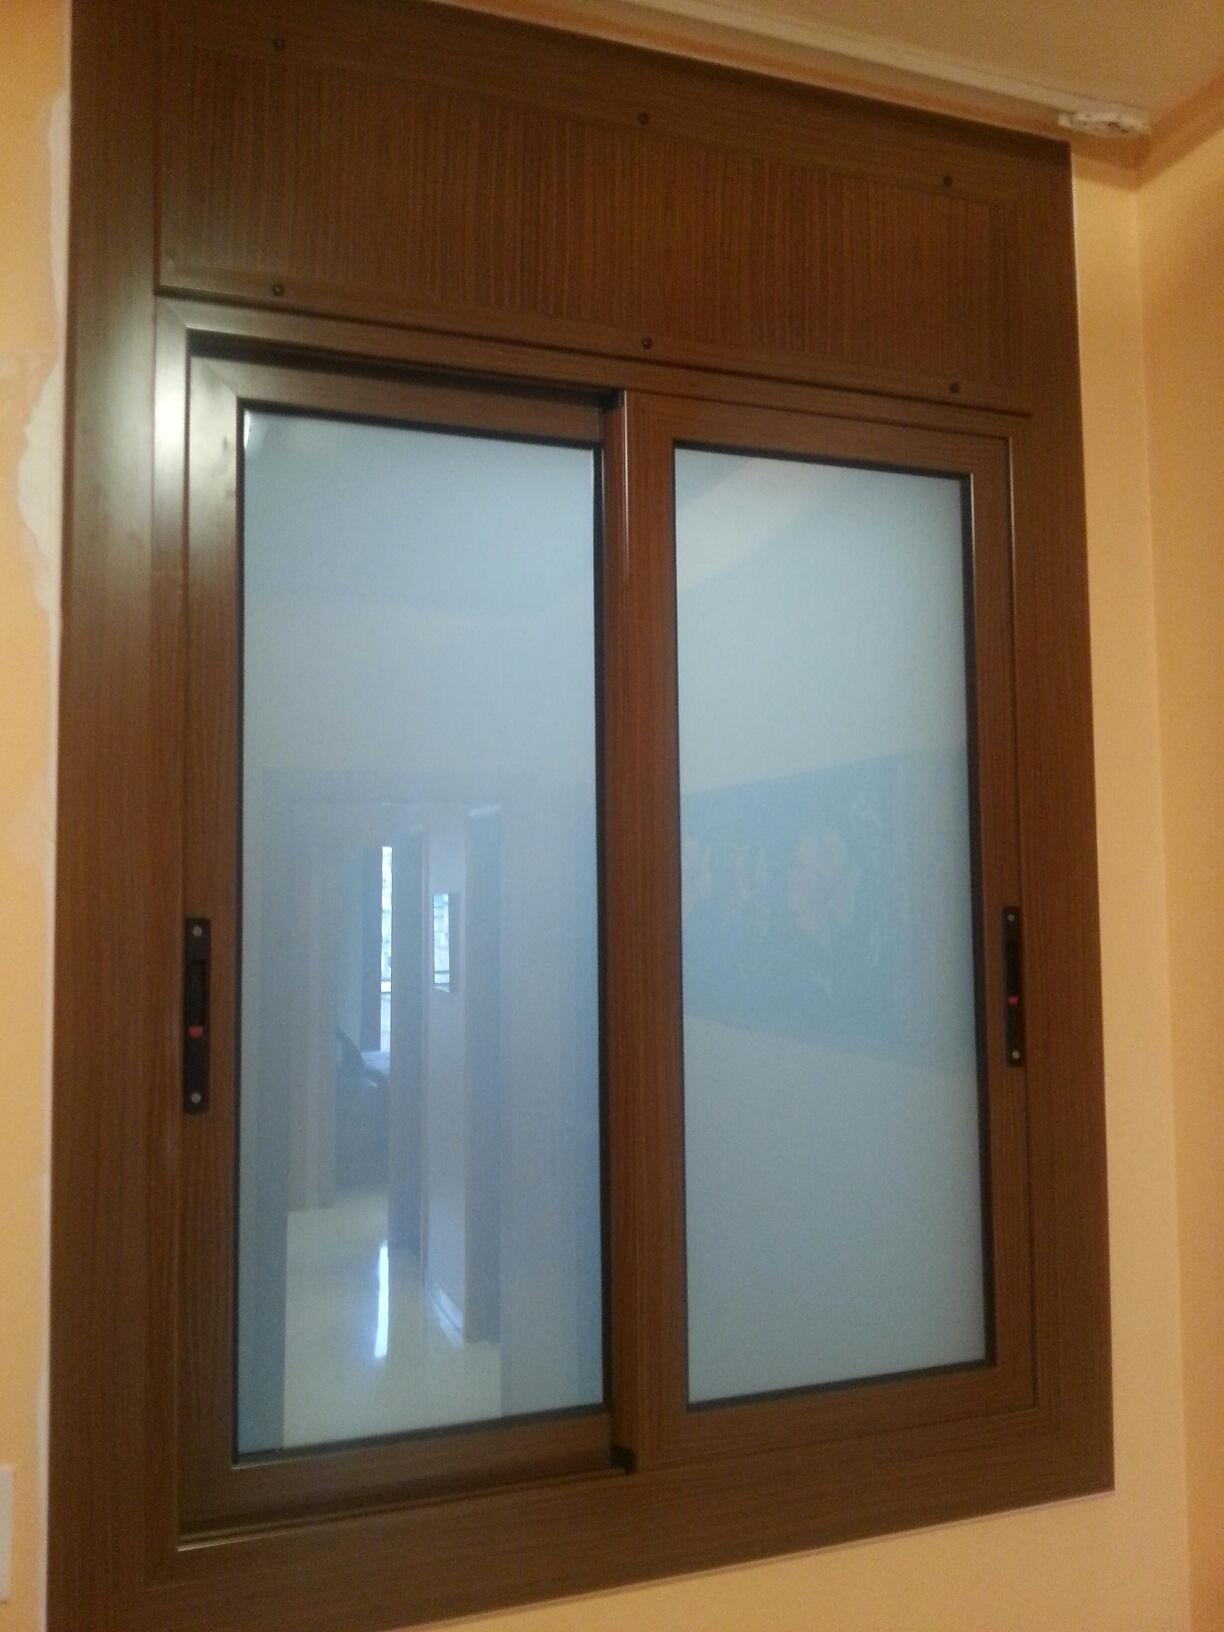 Ventanas de aluminio colores affordable champn perfil de for Colores ventanas aluminio lacado